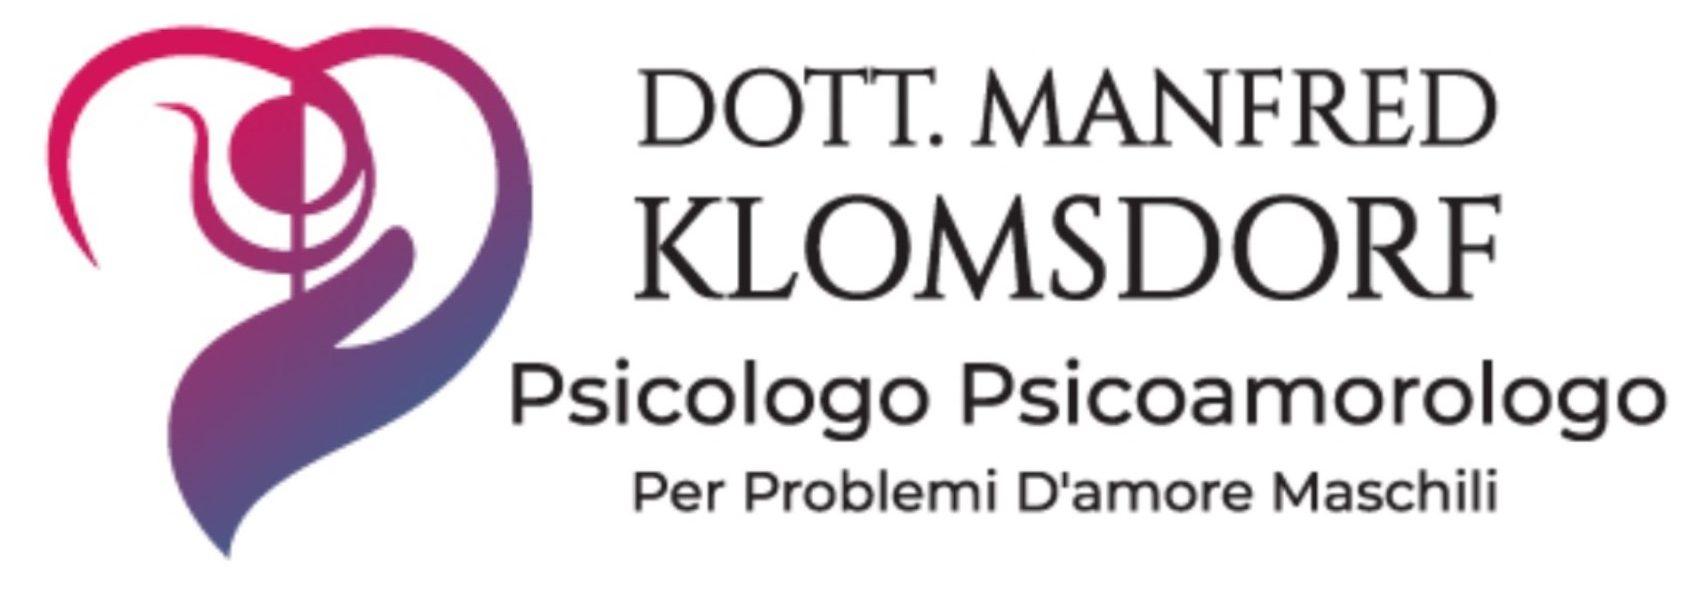 Dott. Manfred Klomsdorf